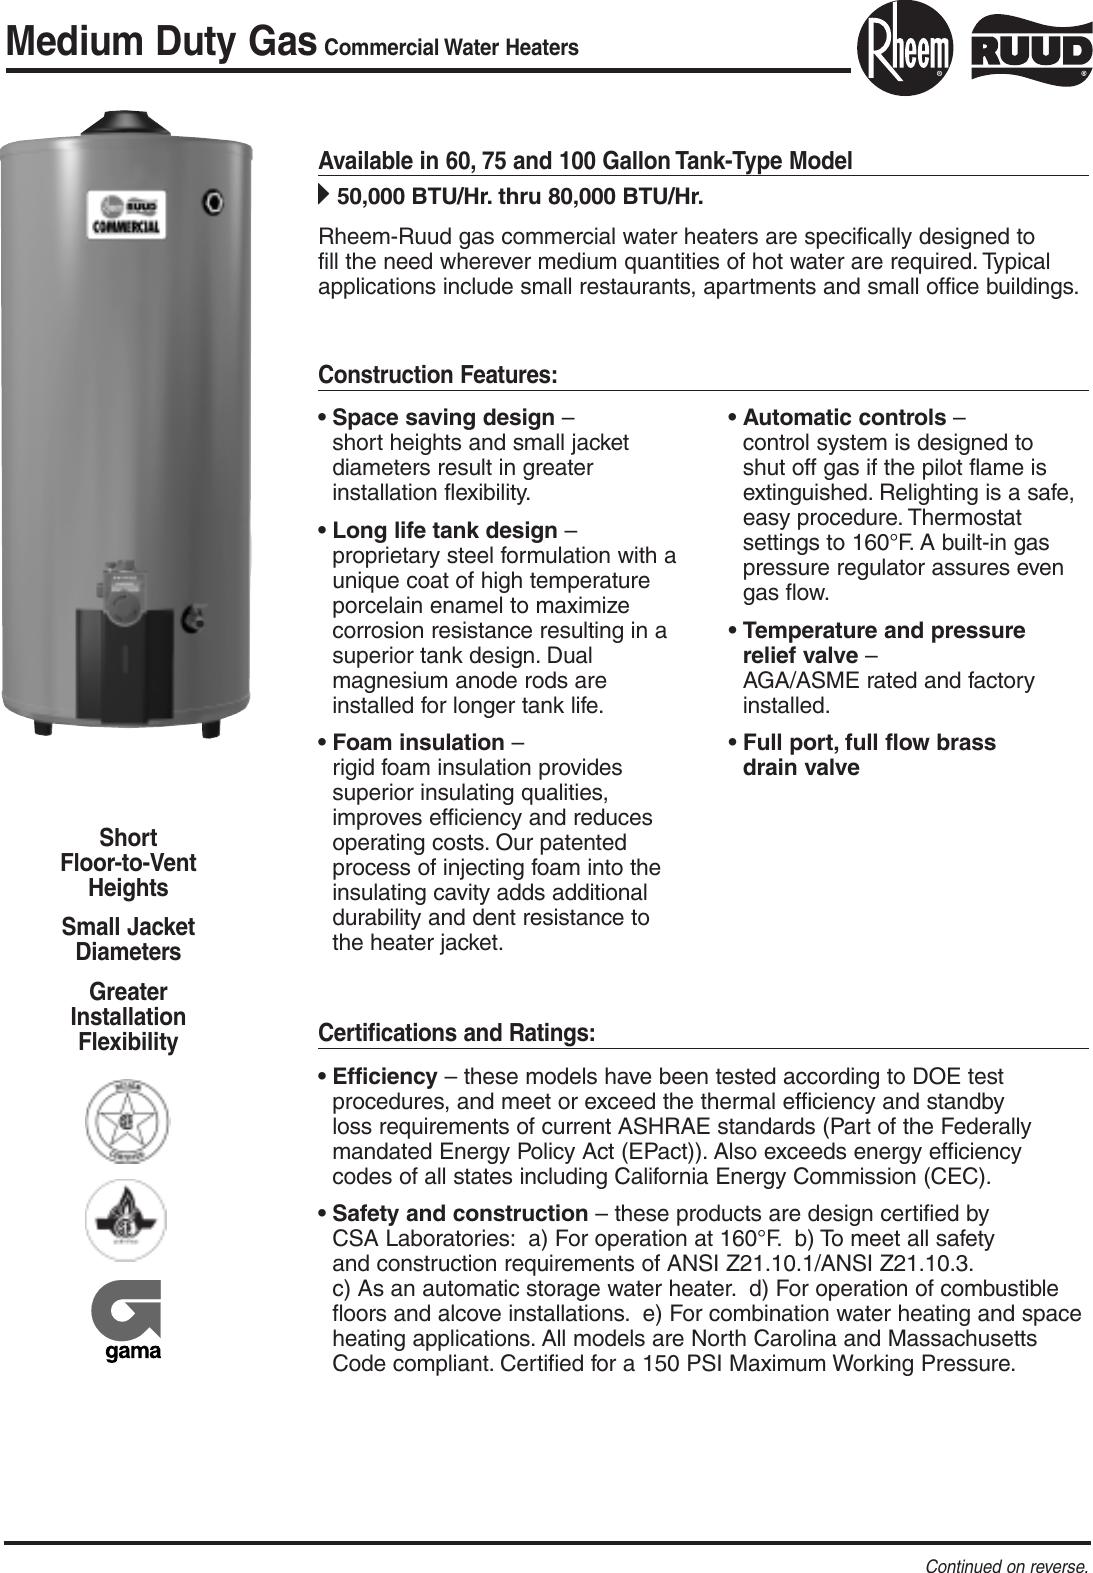 Rheem Medium Duty Gas Water Heaters60 75 100 Gallon Users